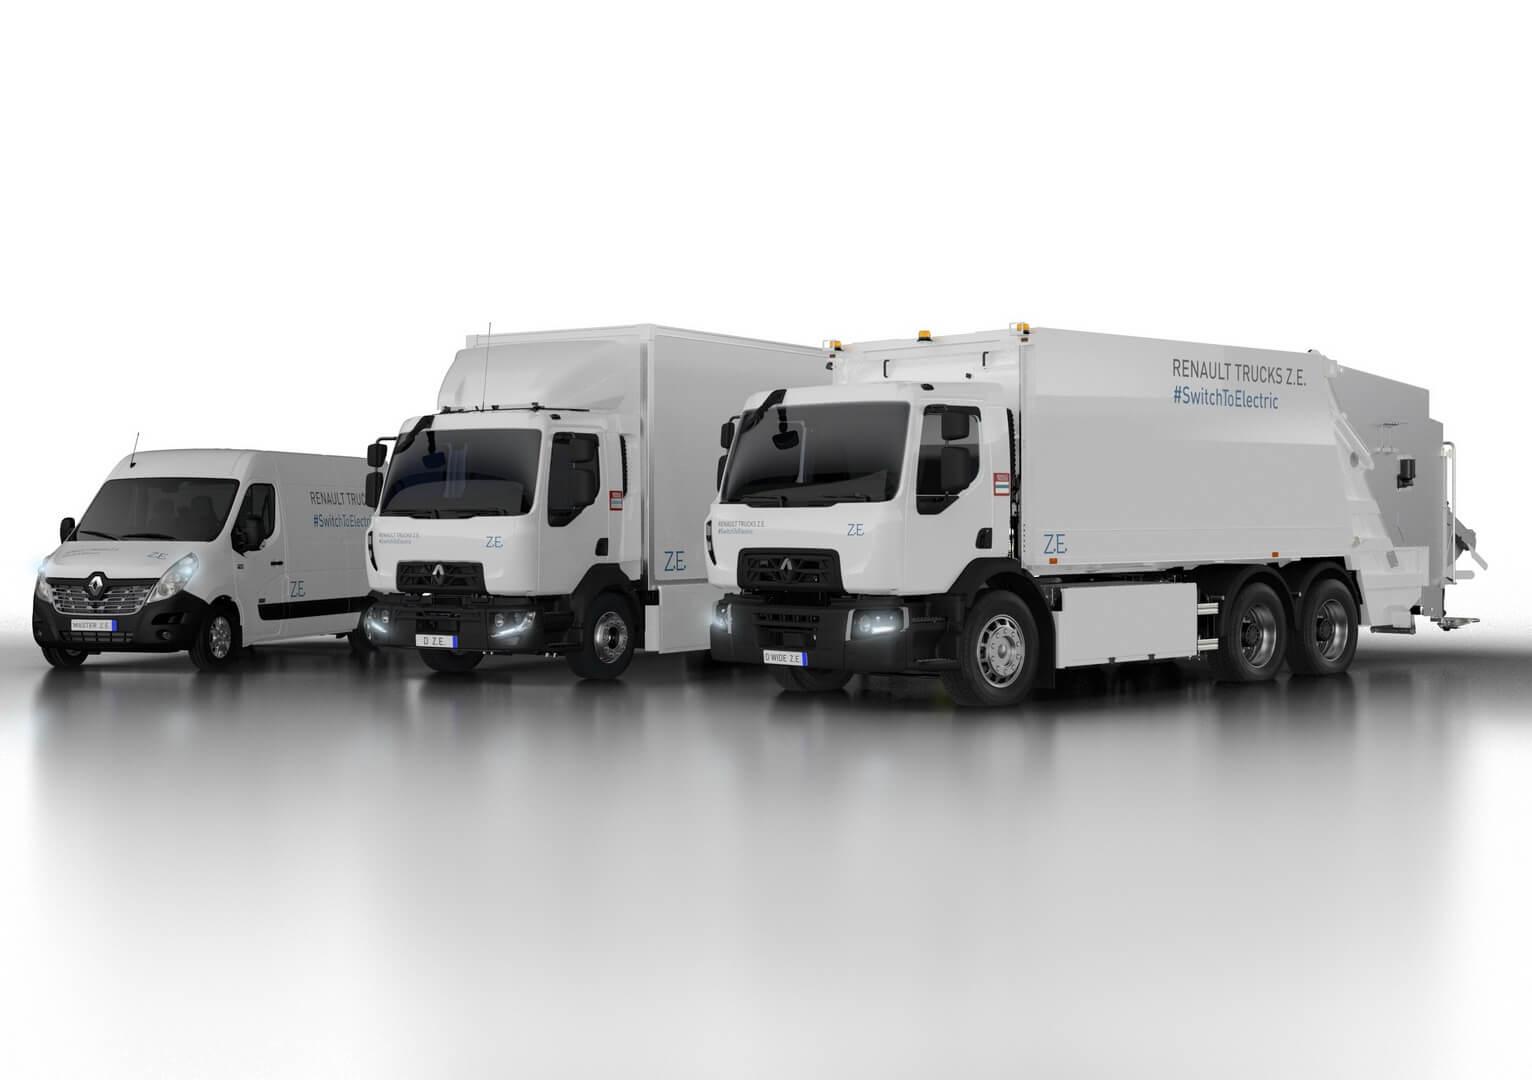 Електричні вантажівки: Renault Master Z.E., Renault Trucks D Z.E., та Renault Trucks D Wide Z.E.